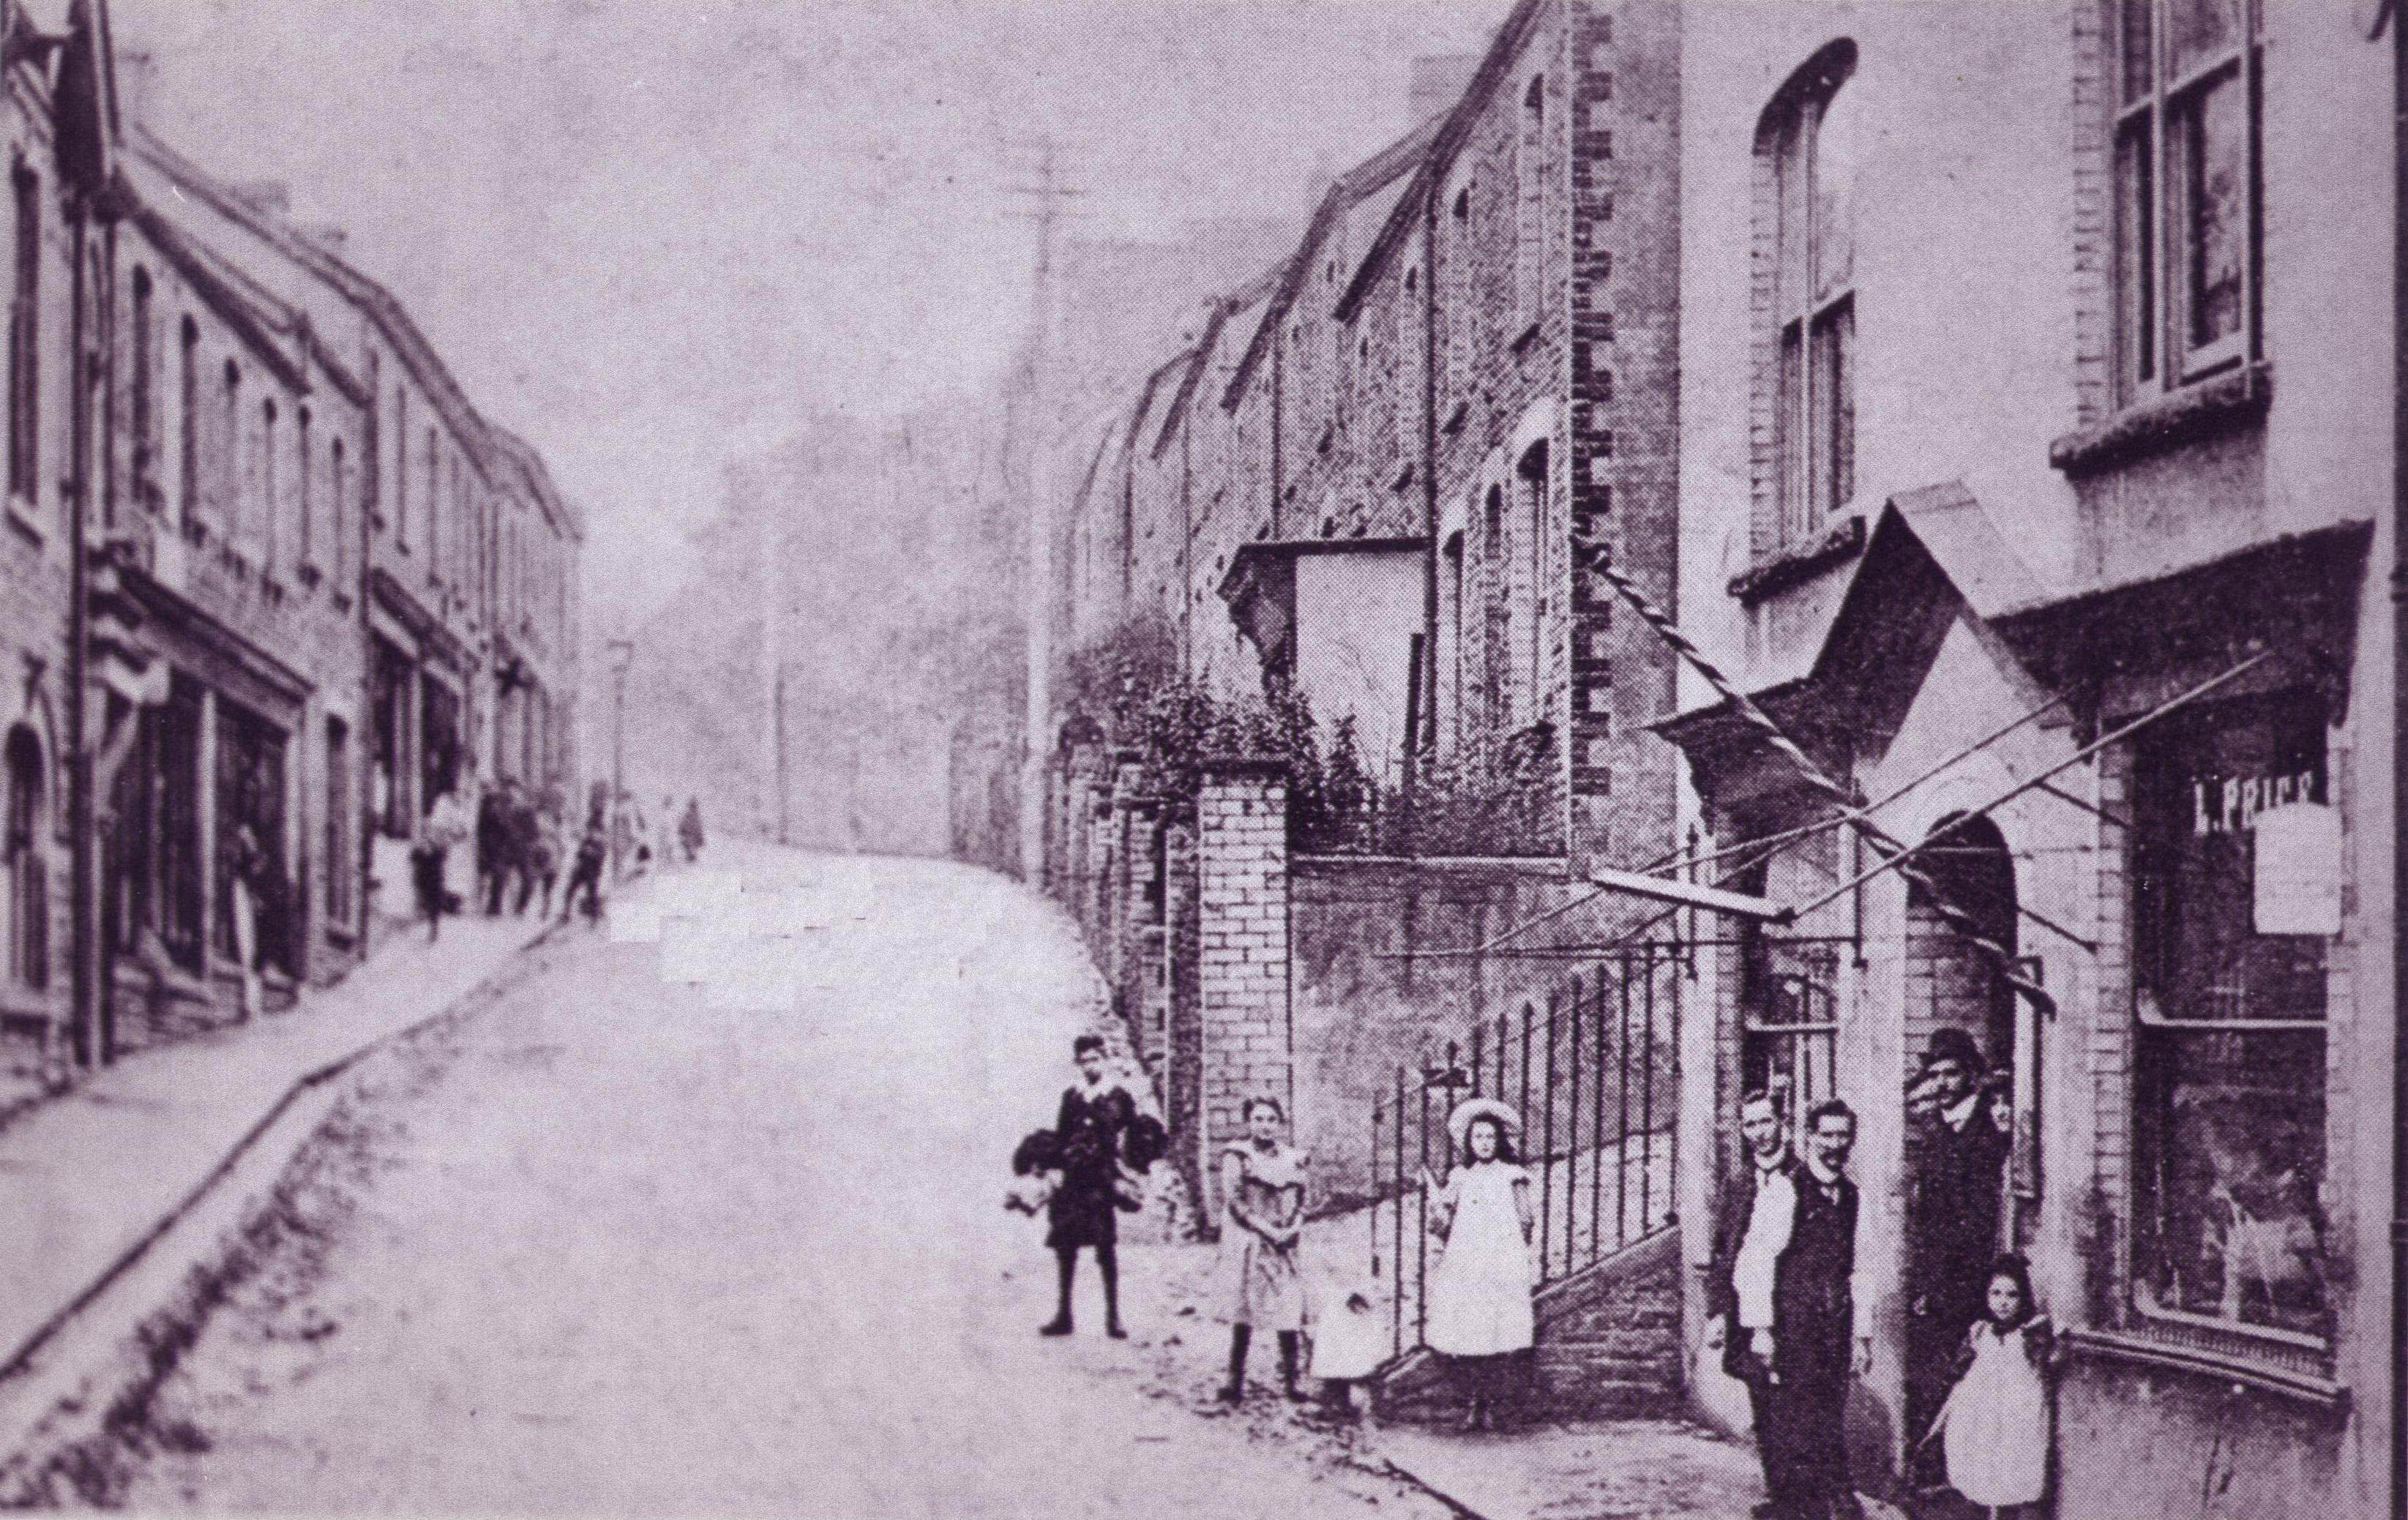 Commercial Road, Llanhilleth 4